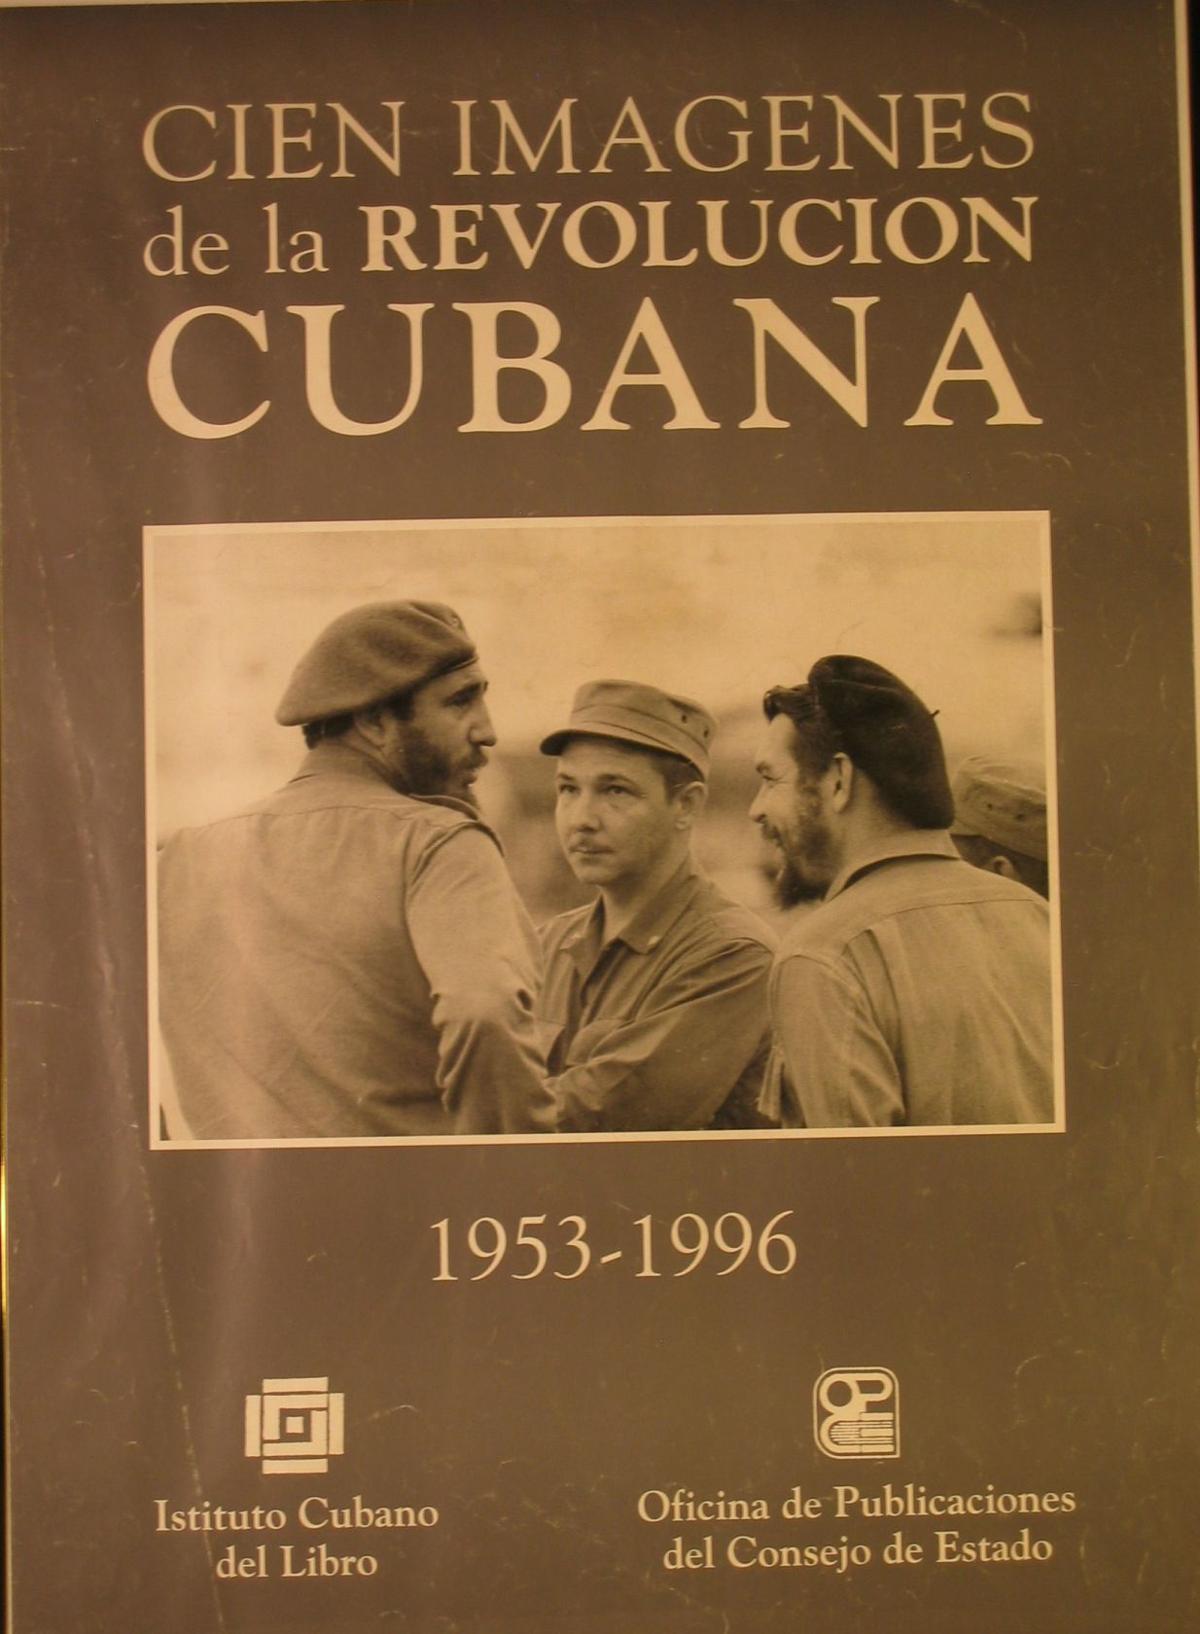 Cuba 10 (copy)